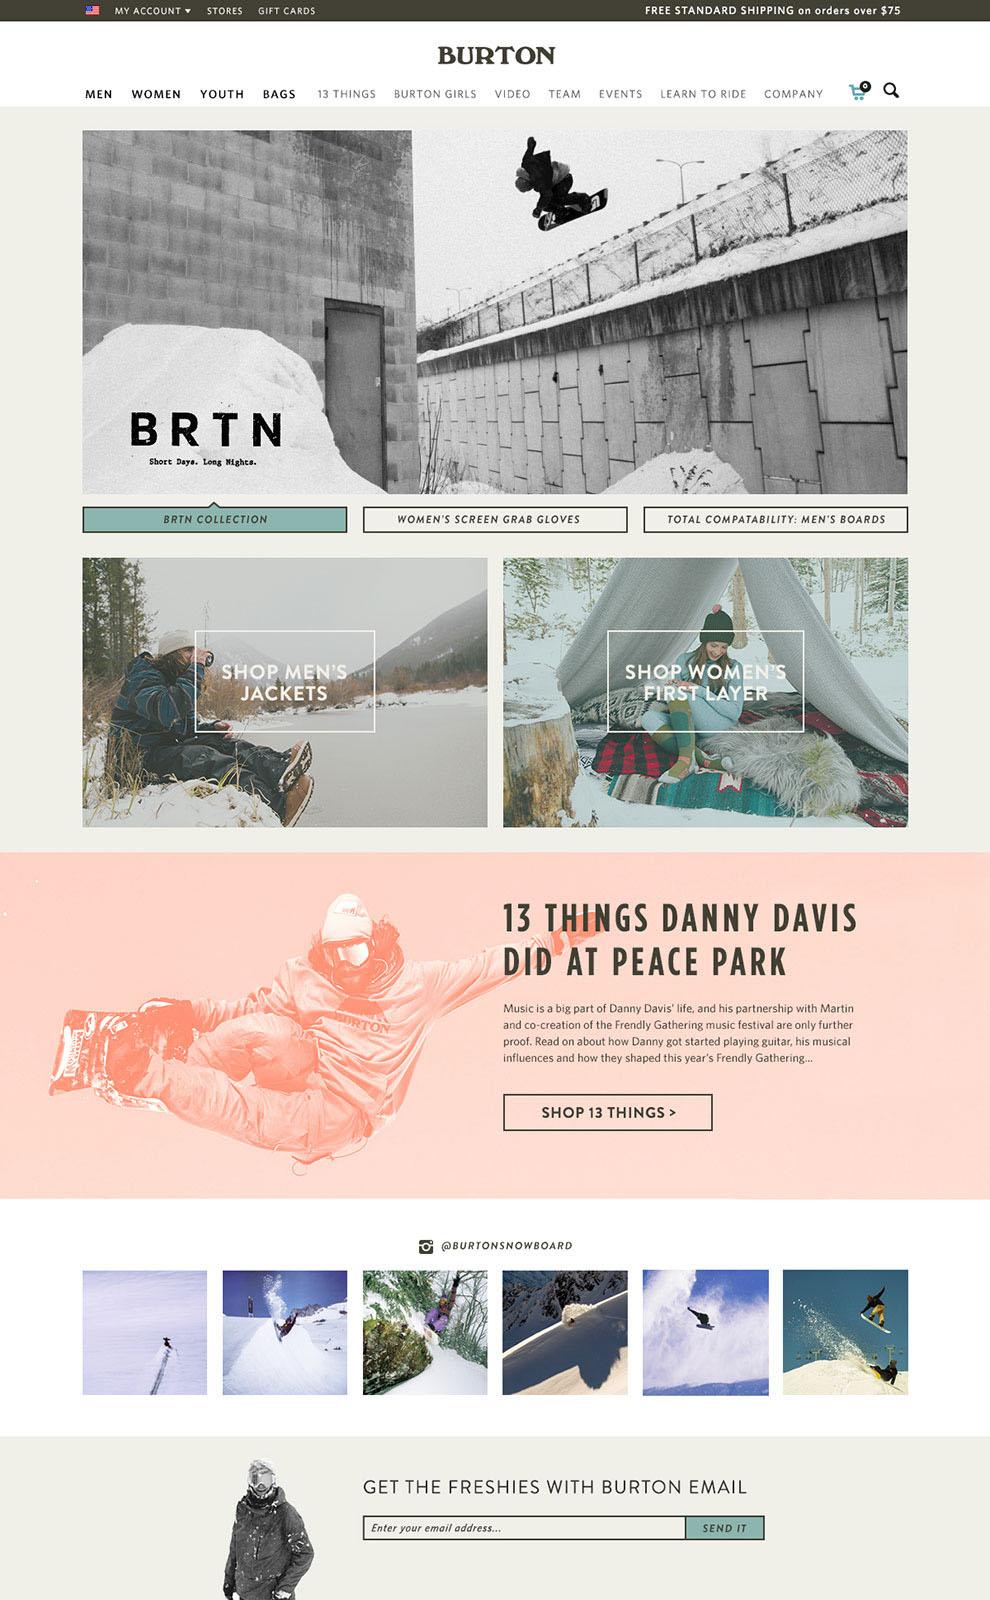 FW15-Burton-Homepage.jpg